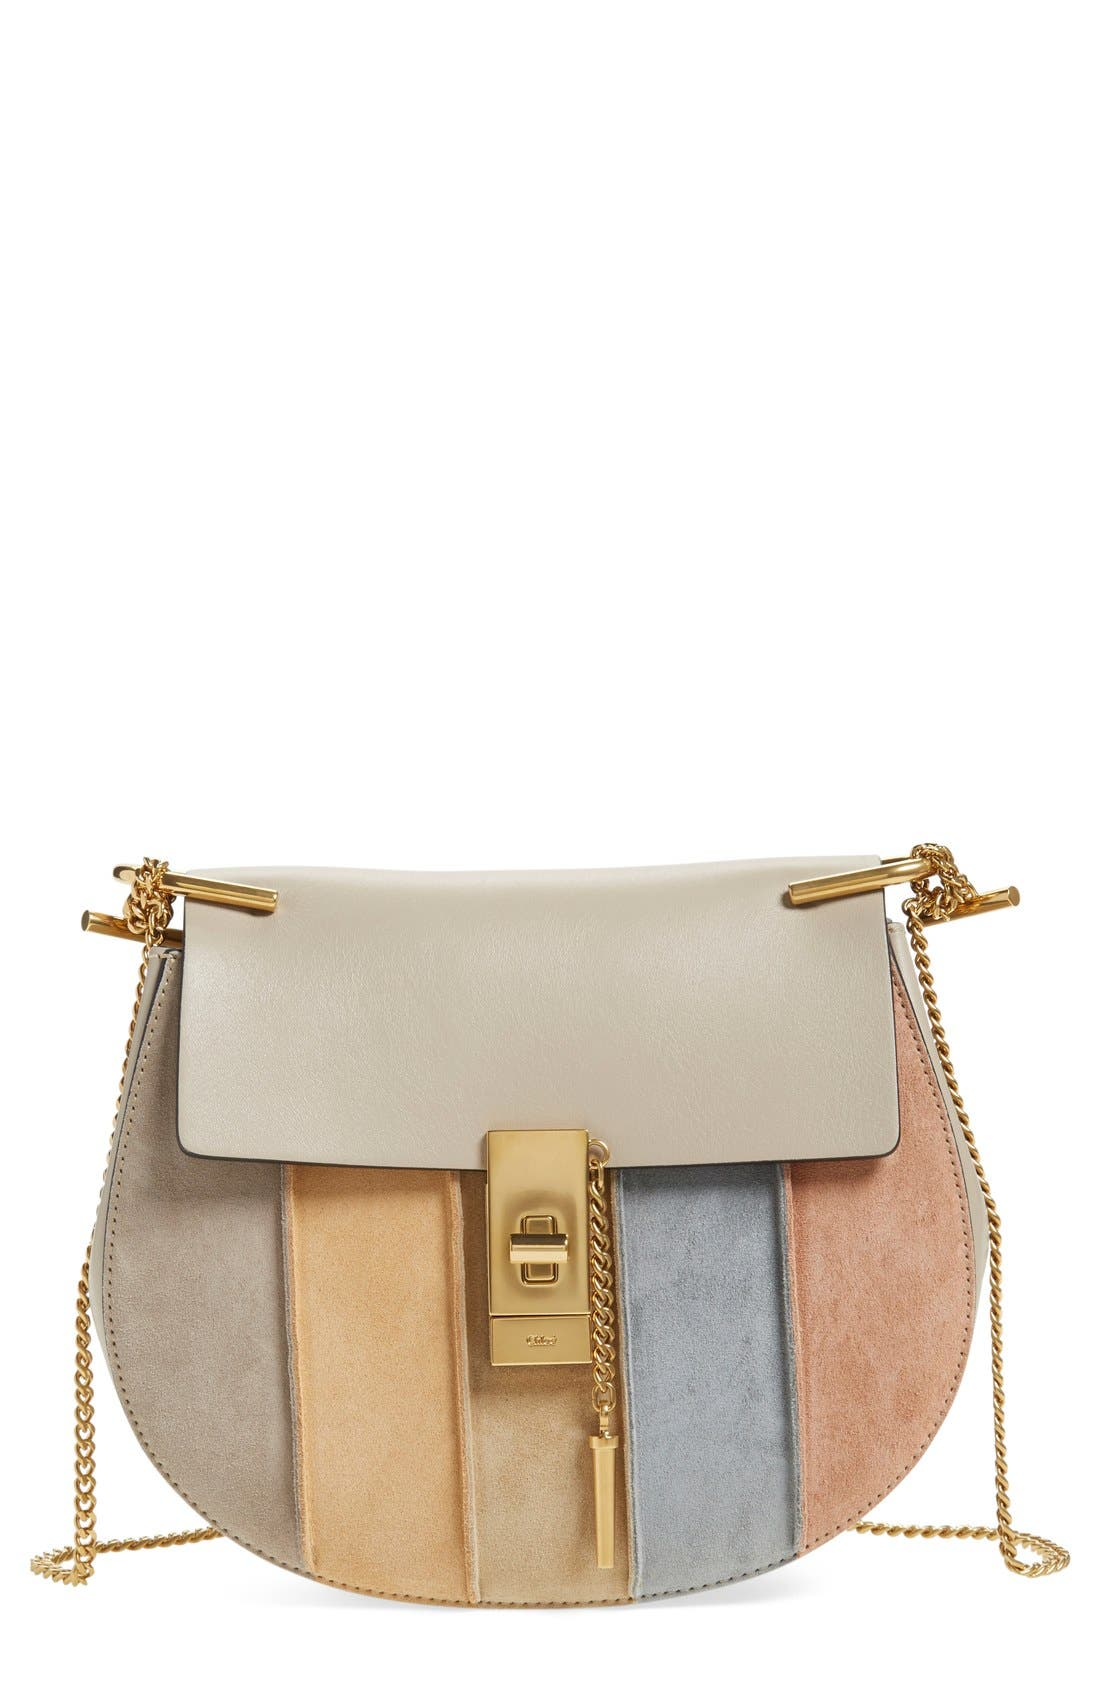 Alternate Image 1 Selected - Chloé 'Small Drew' Suede Stripe Shoulder Bag